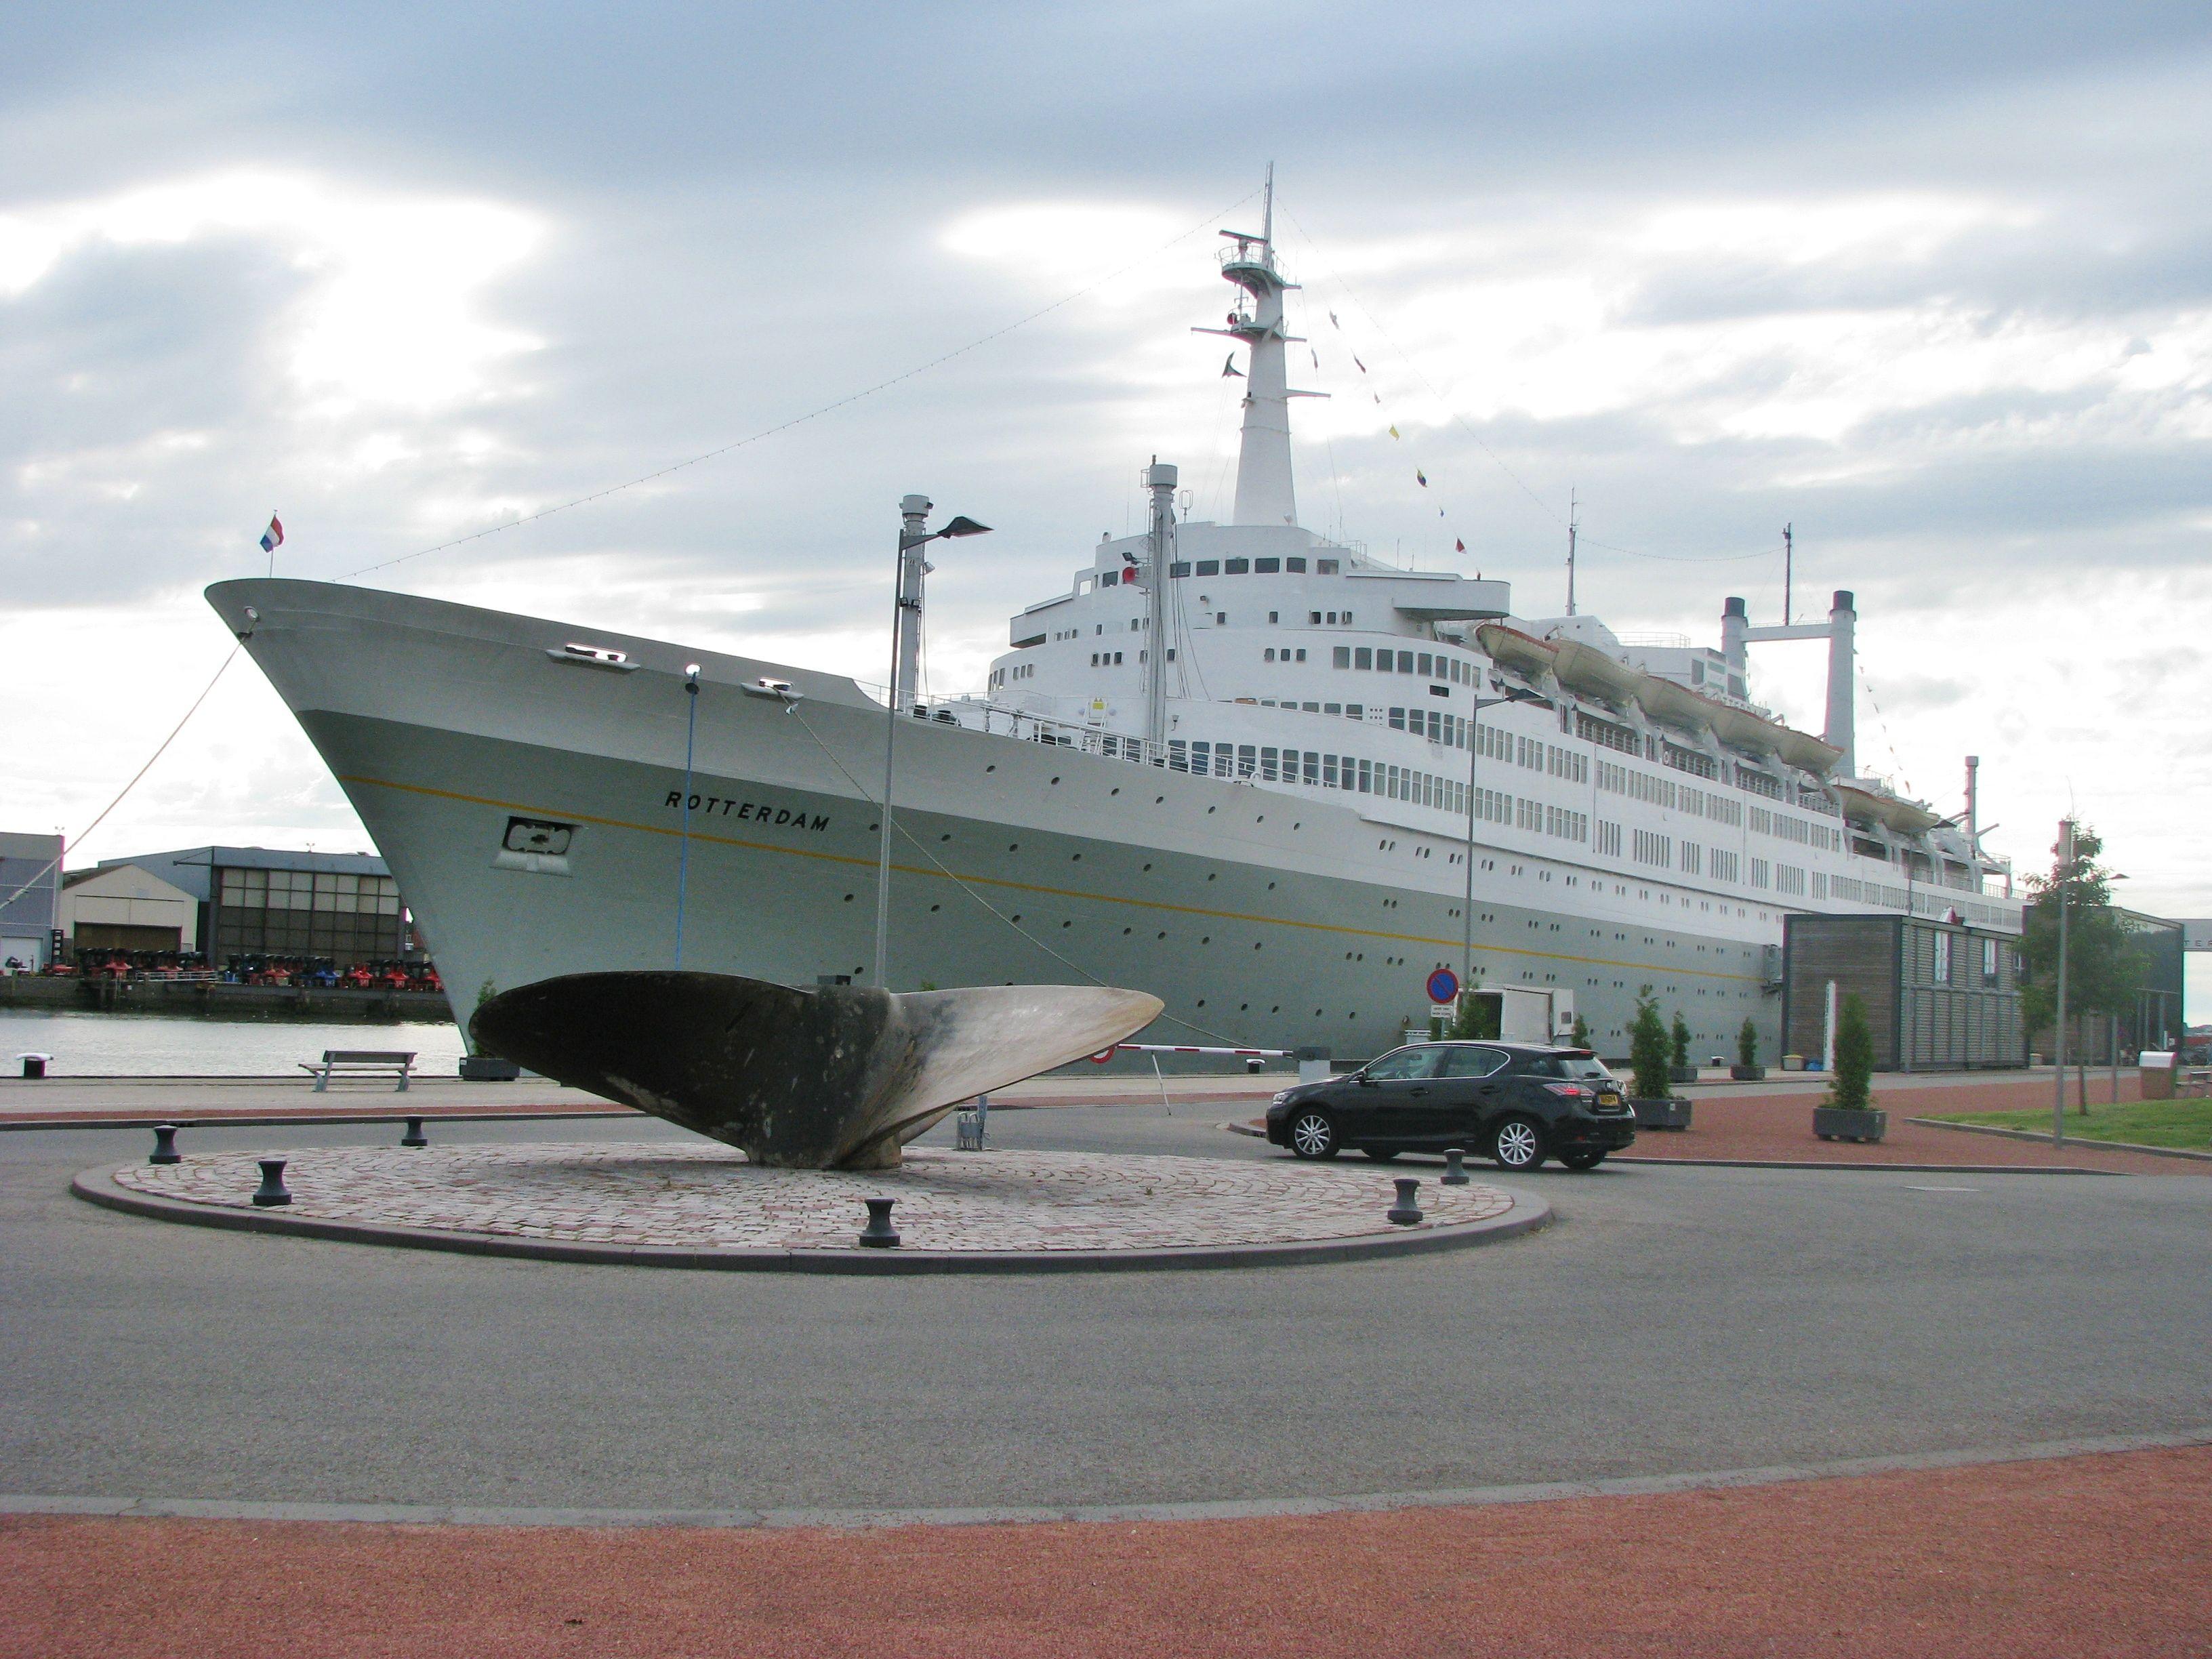 Ms Rotterdam Hotel Ship Port Of